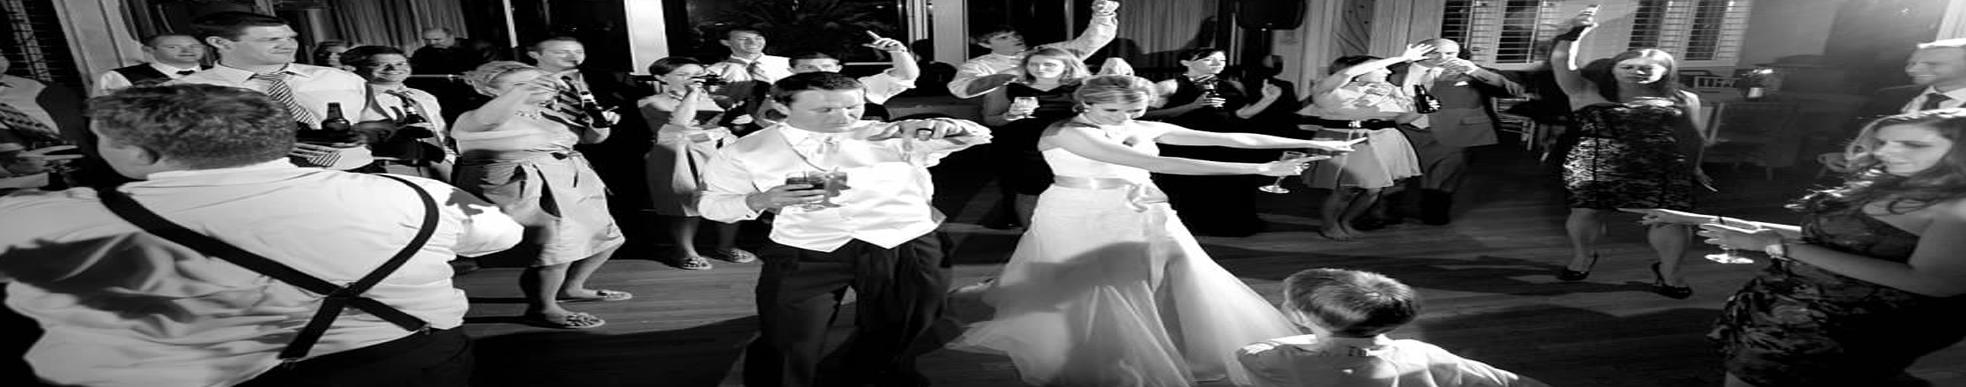 Wedding Formal